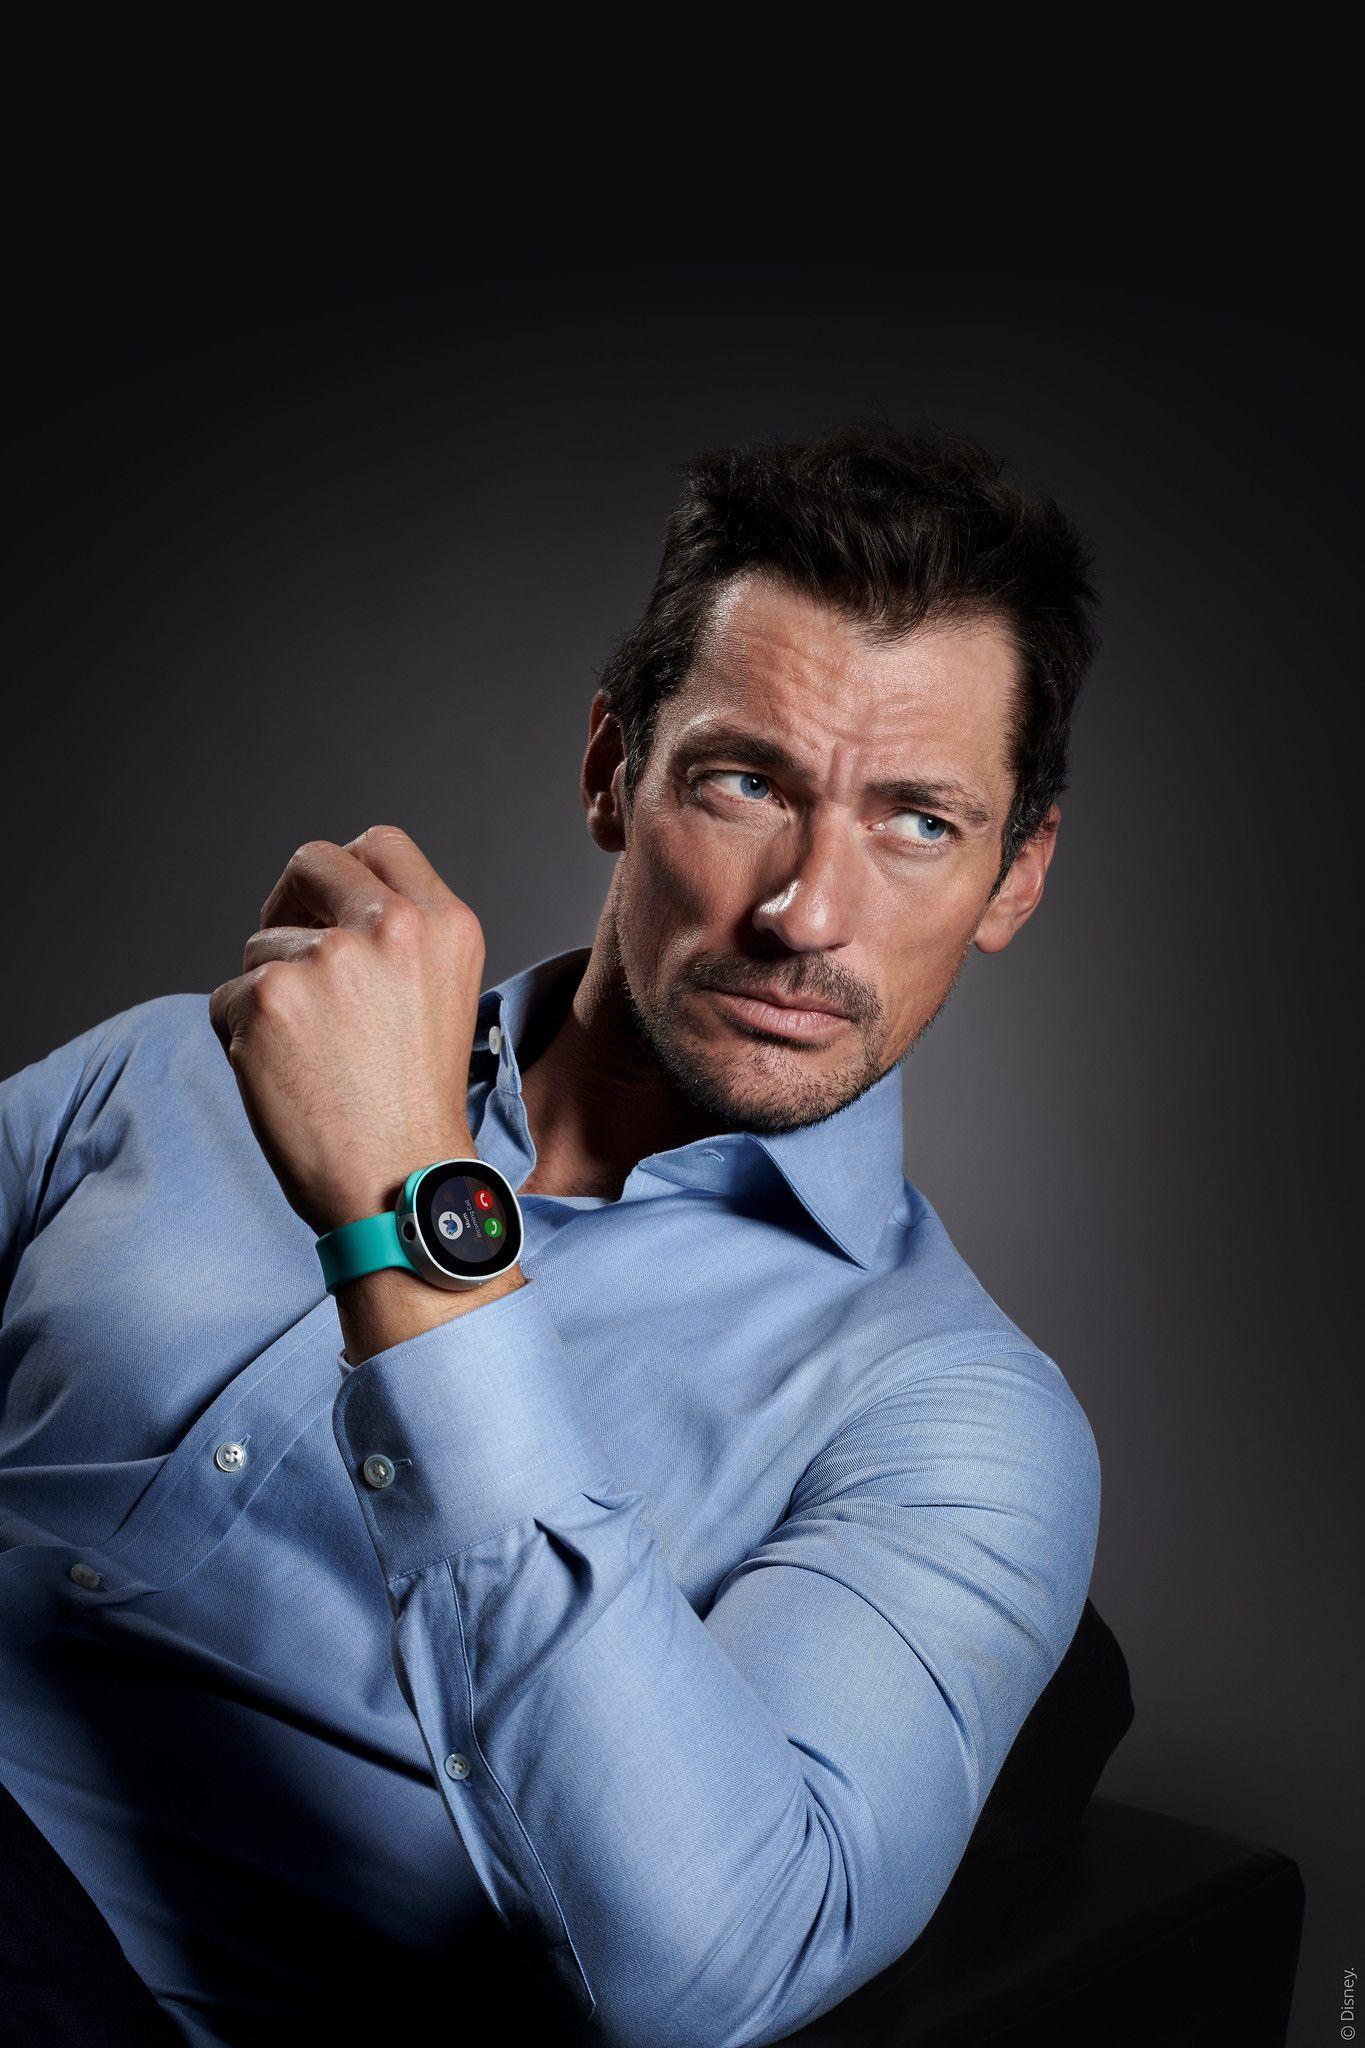 Fotografia Vodafone se alía con el famoso modelo internacional David